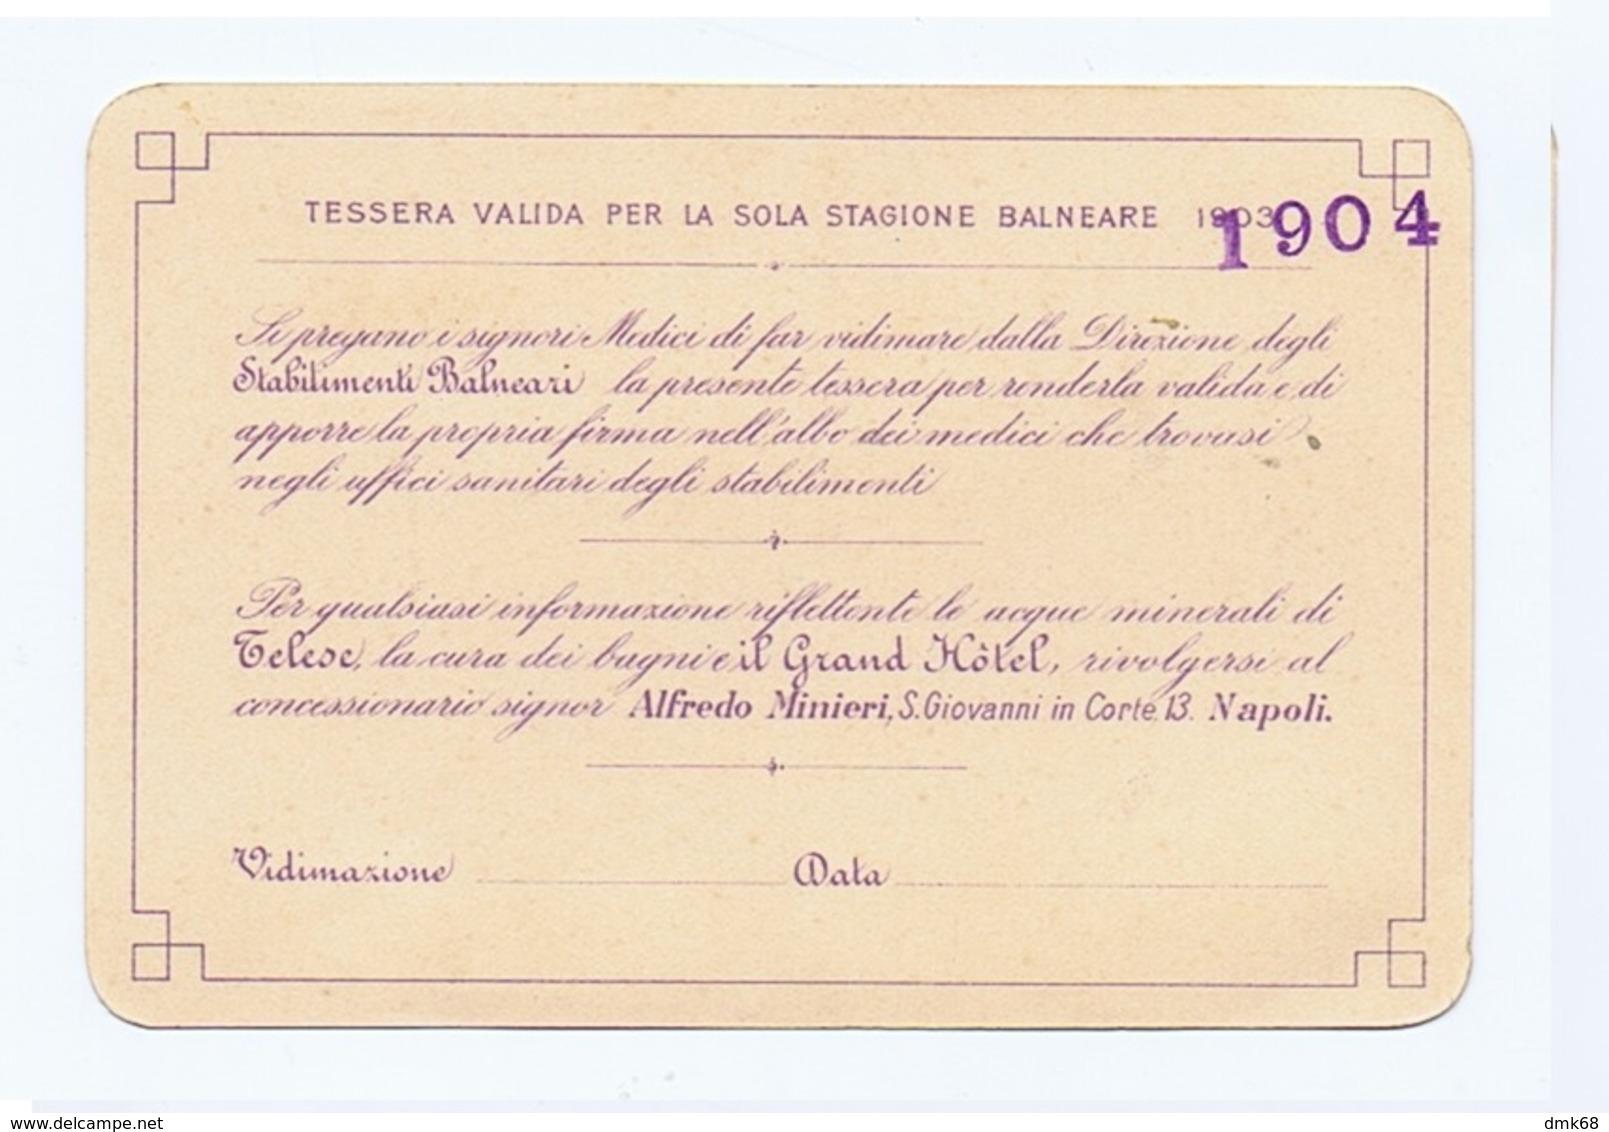 TELESE ( BENEVENTO ) GRANDI STABILIMENTI BALNEARI GRAND HOTEL - TESSERA 1904 ( 3703 ) - Historical Documents